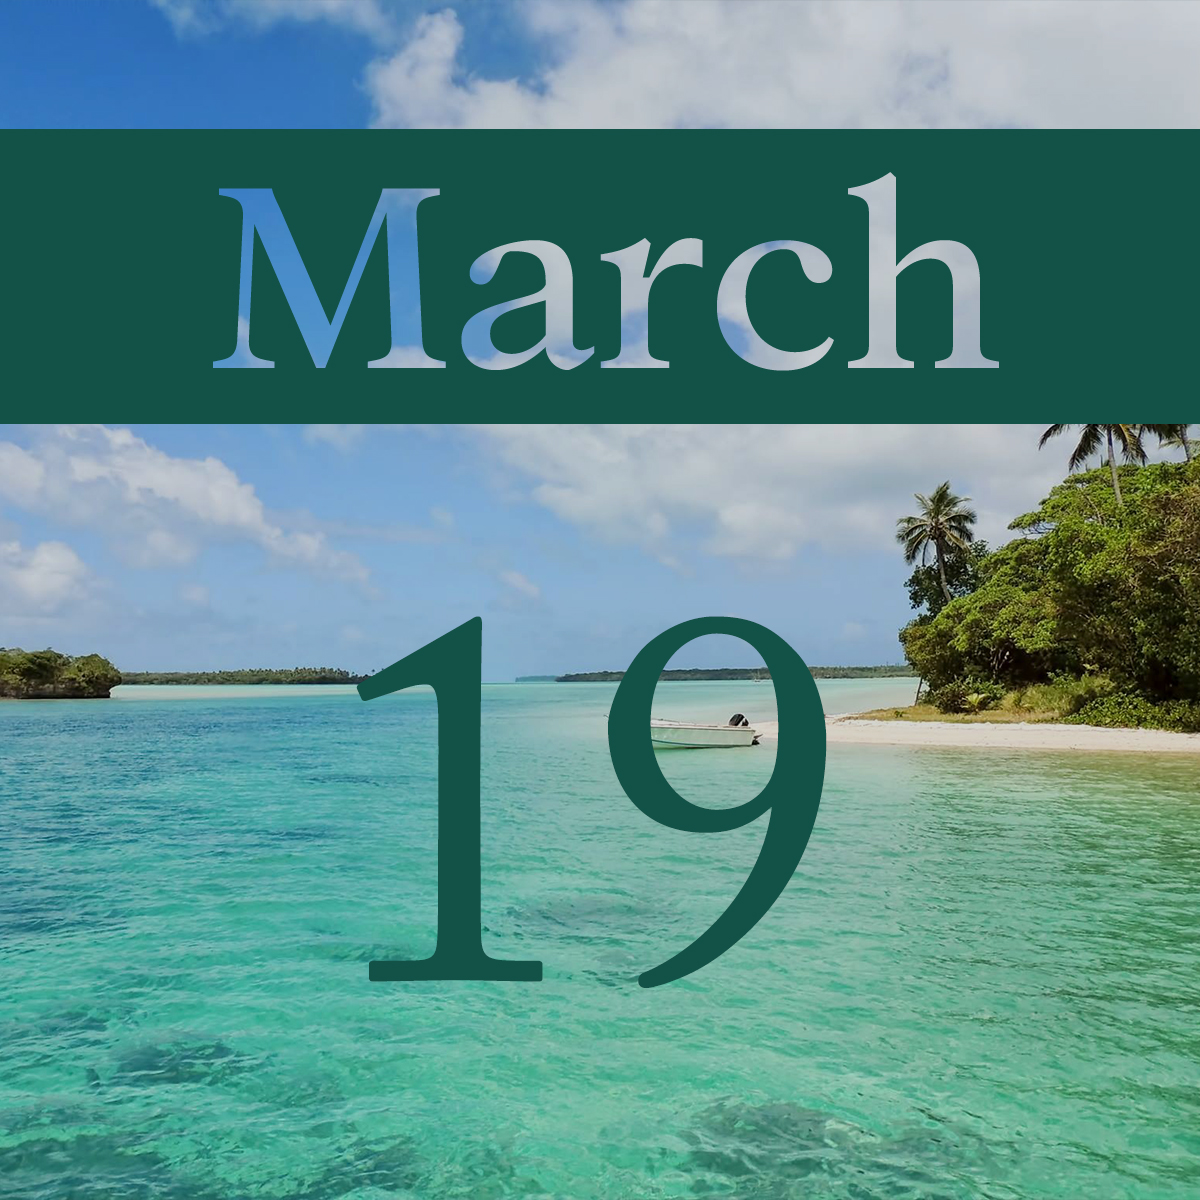 Thursday, March 19th